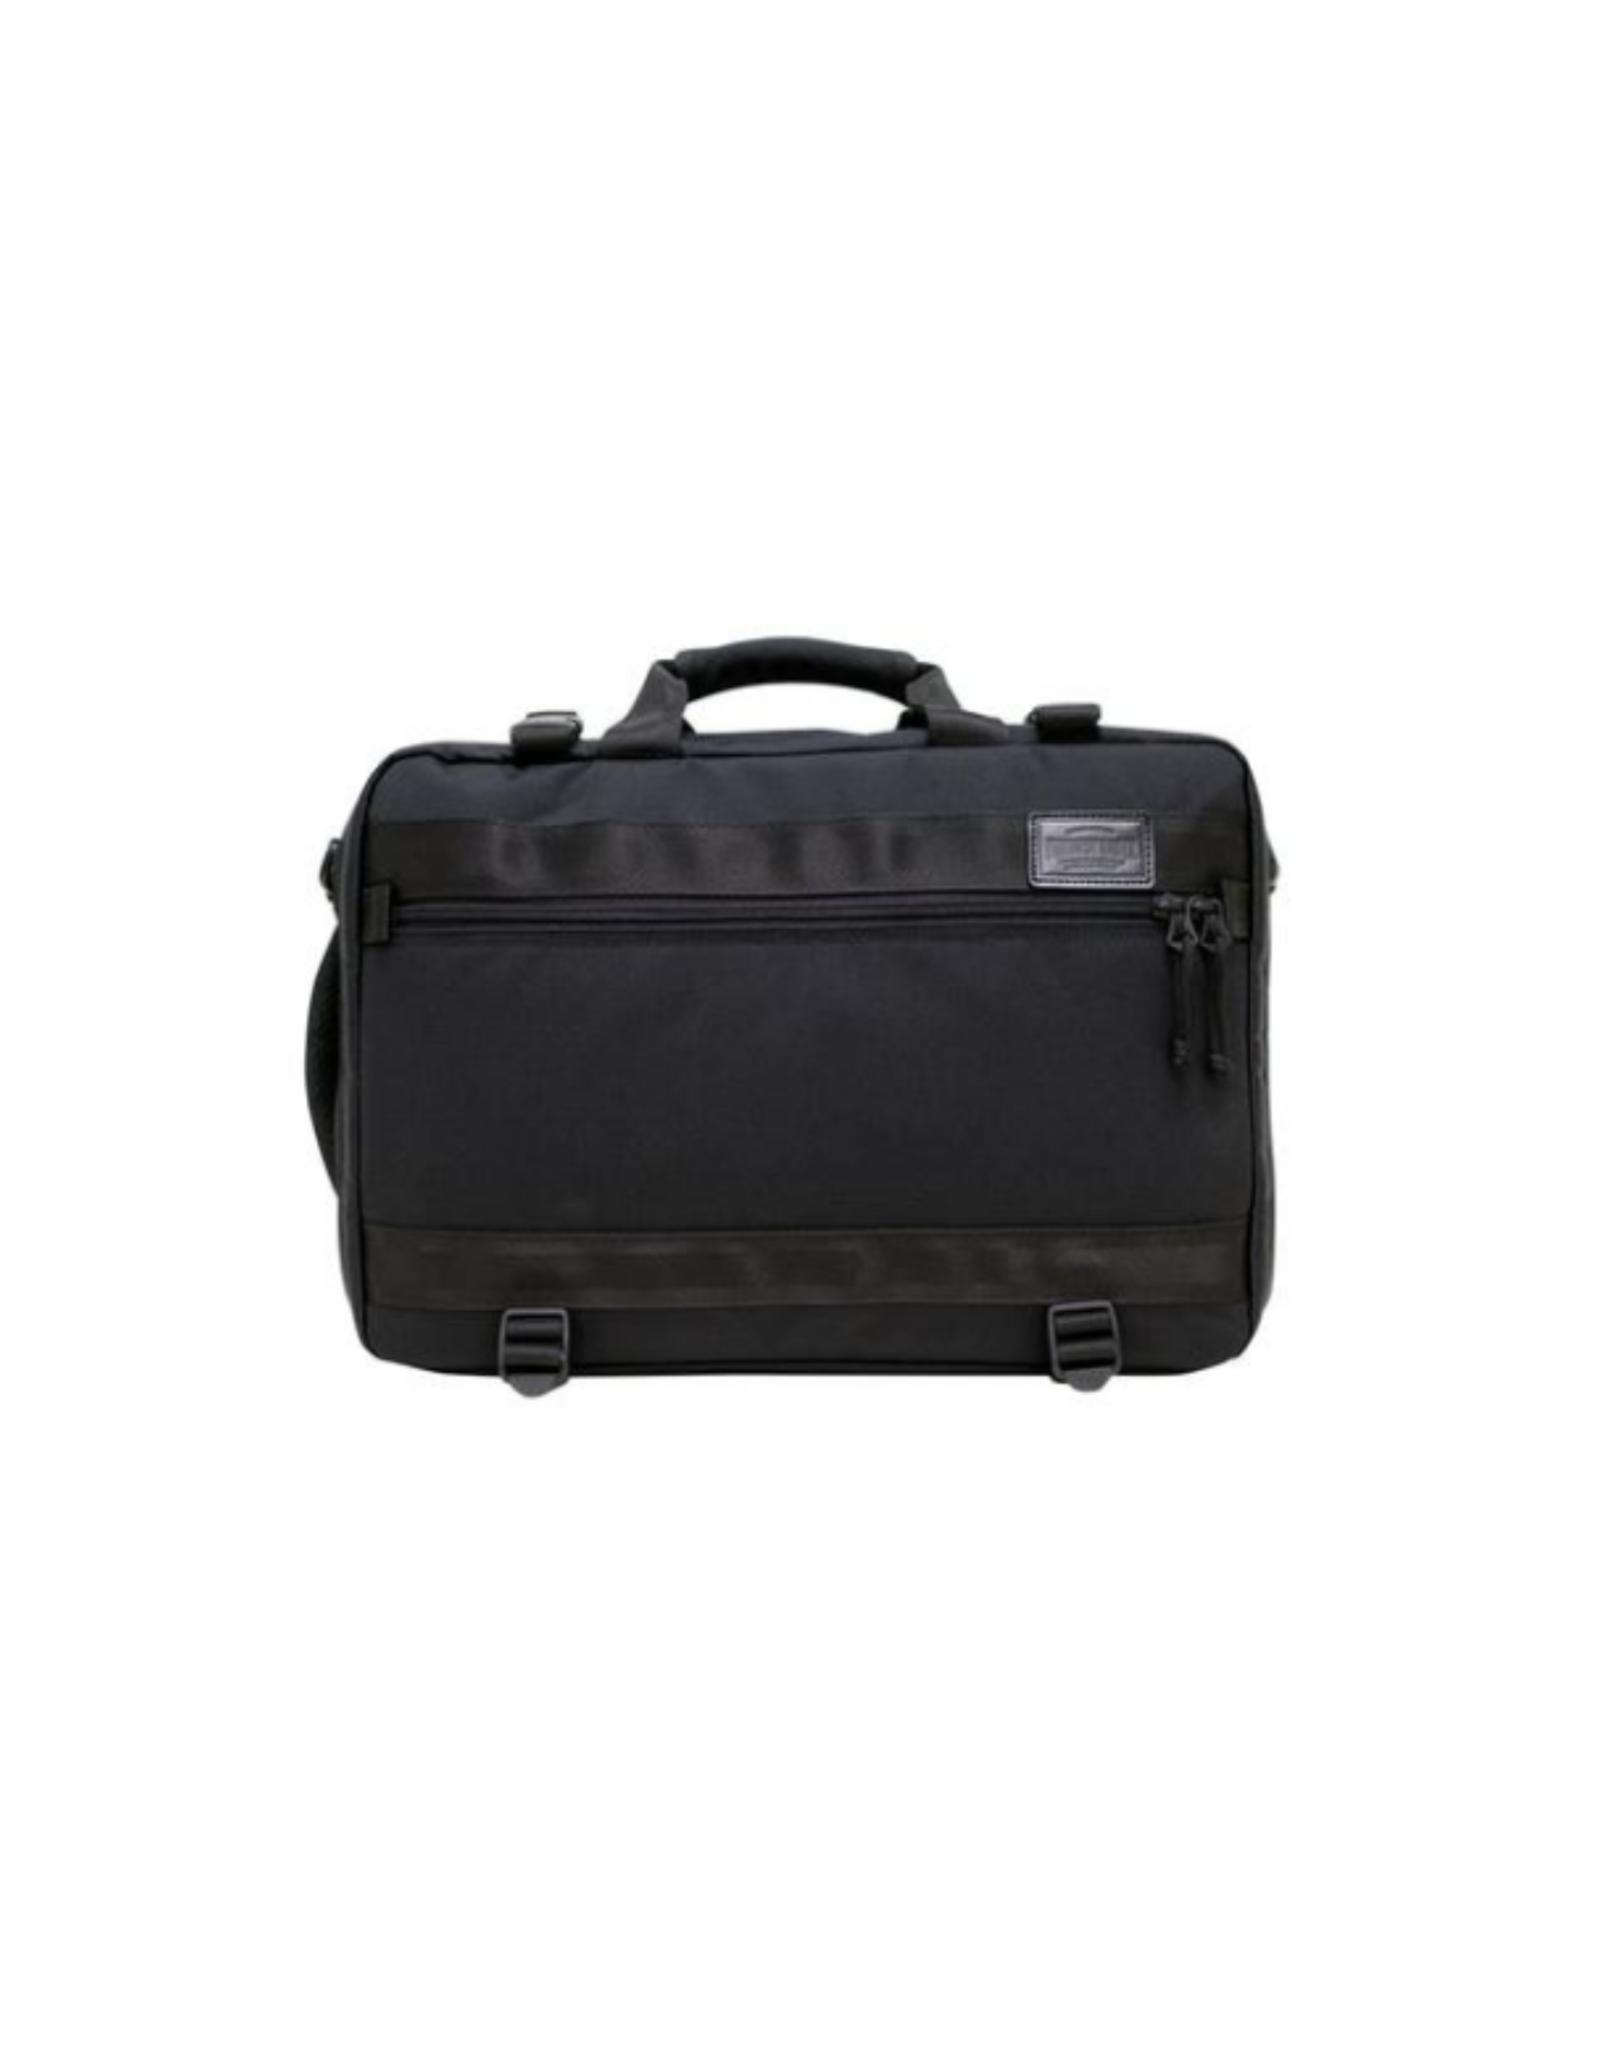 3 Way Traveller Pack - Midnight